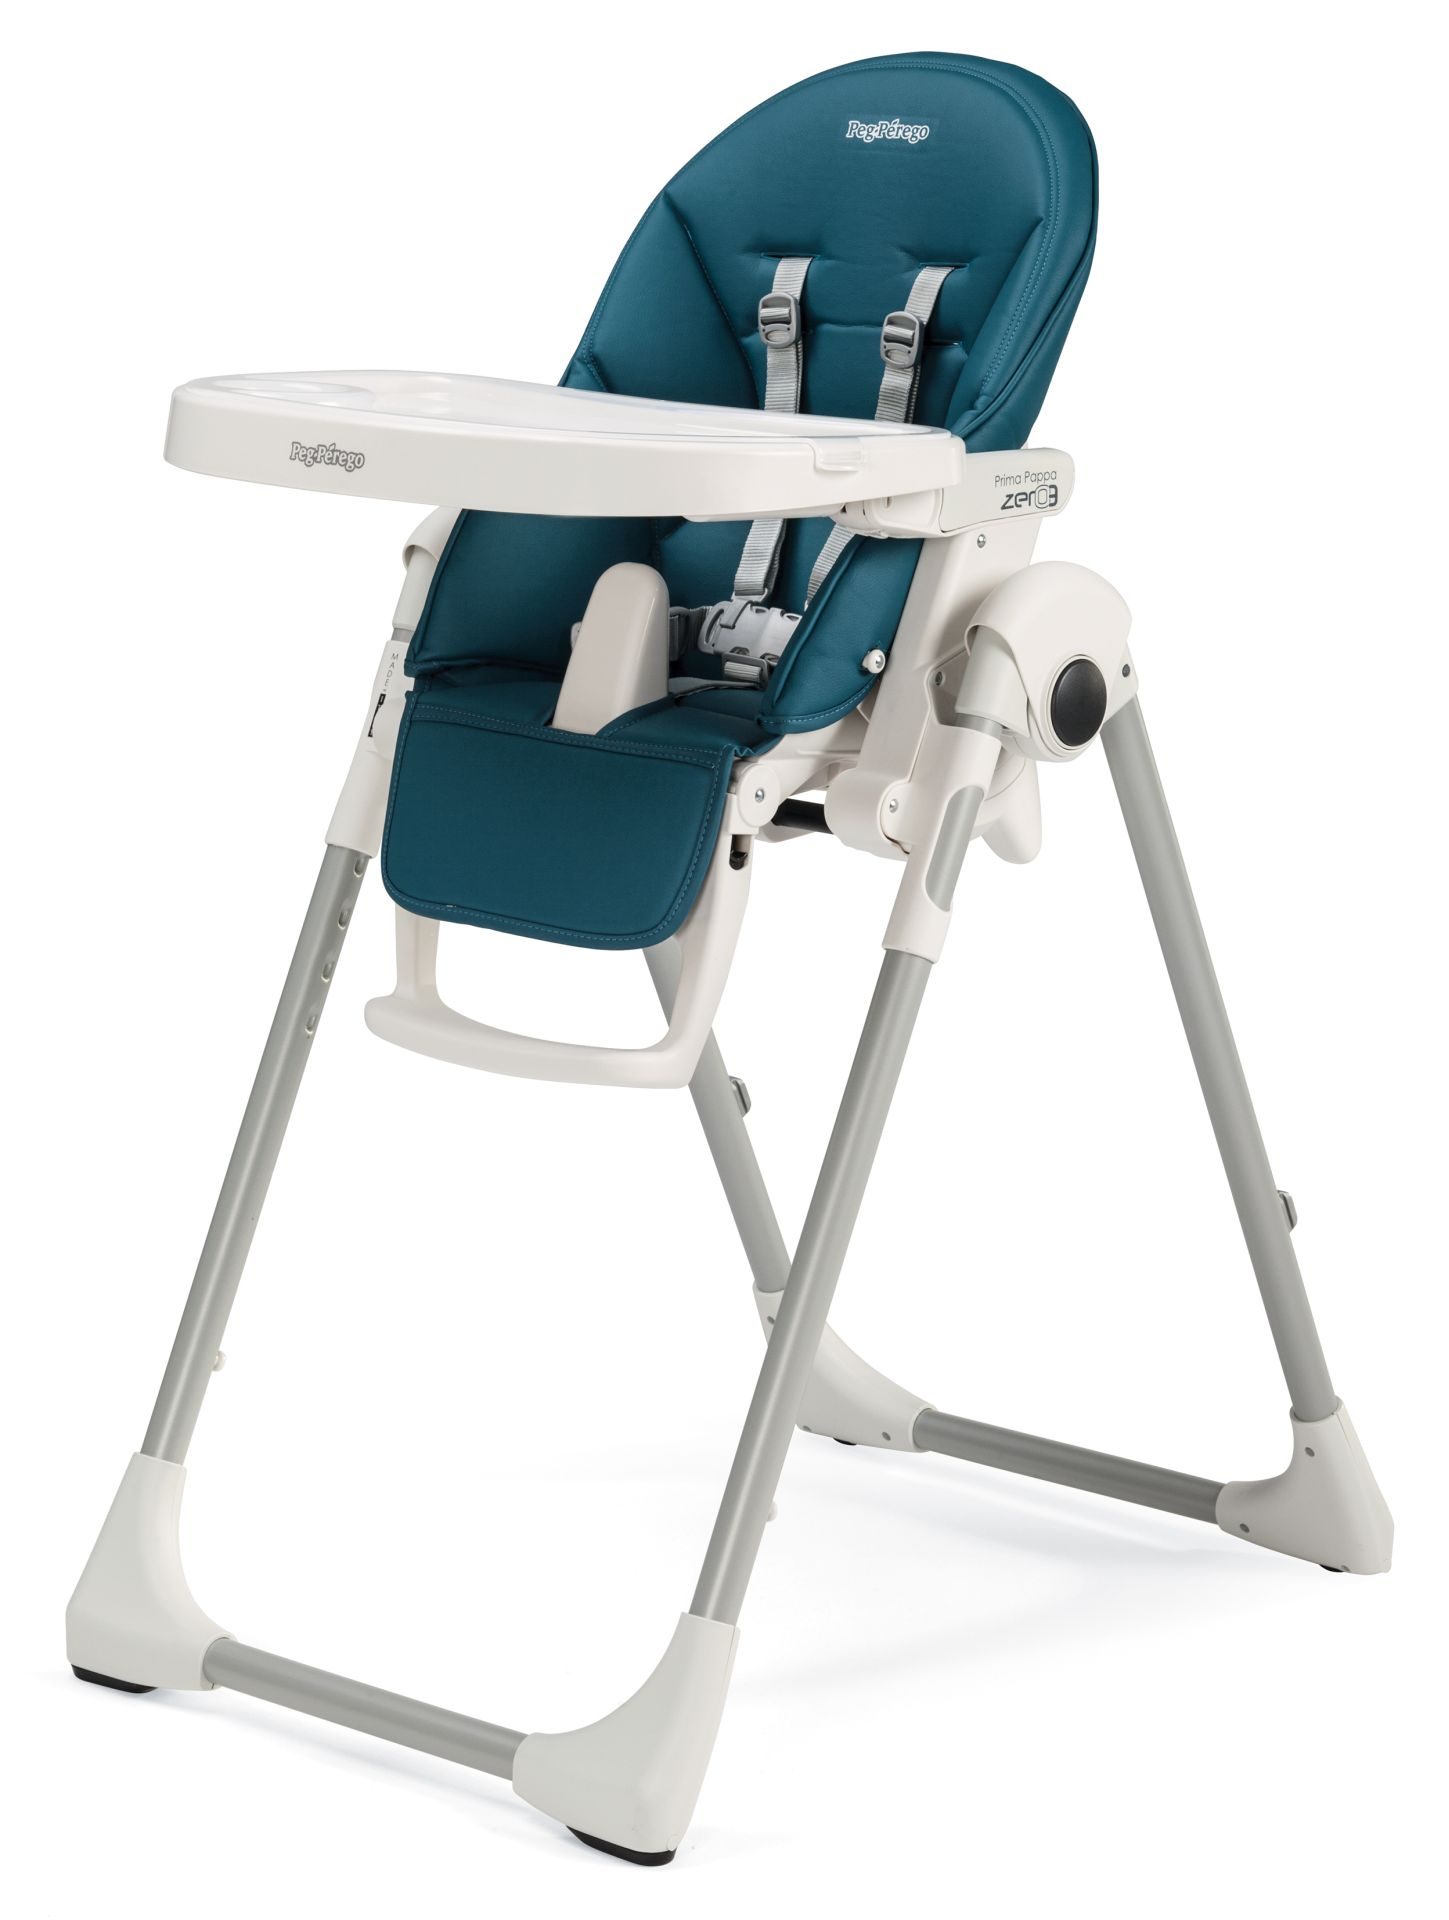 peg perego tatamia high chair revolving manufacturers in chennai prima pappa zero3 2018 petrolio